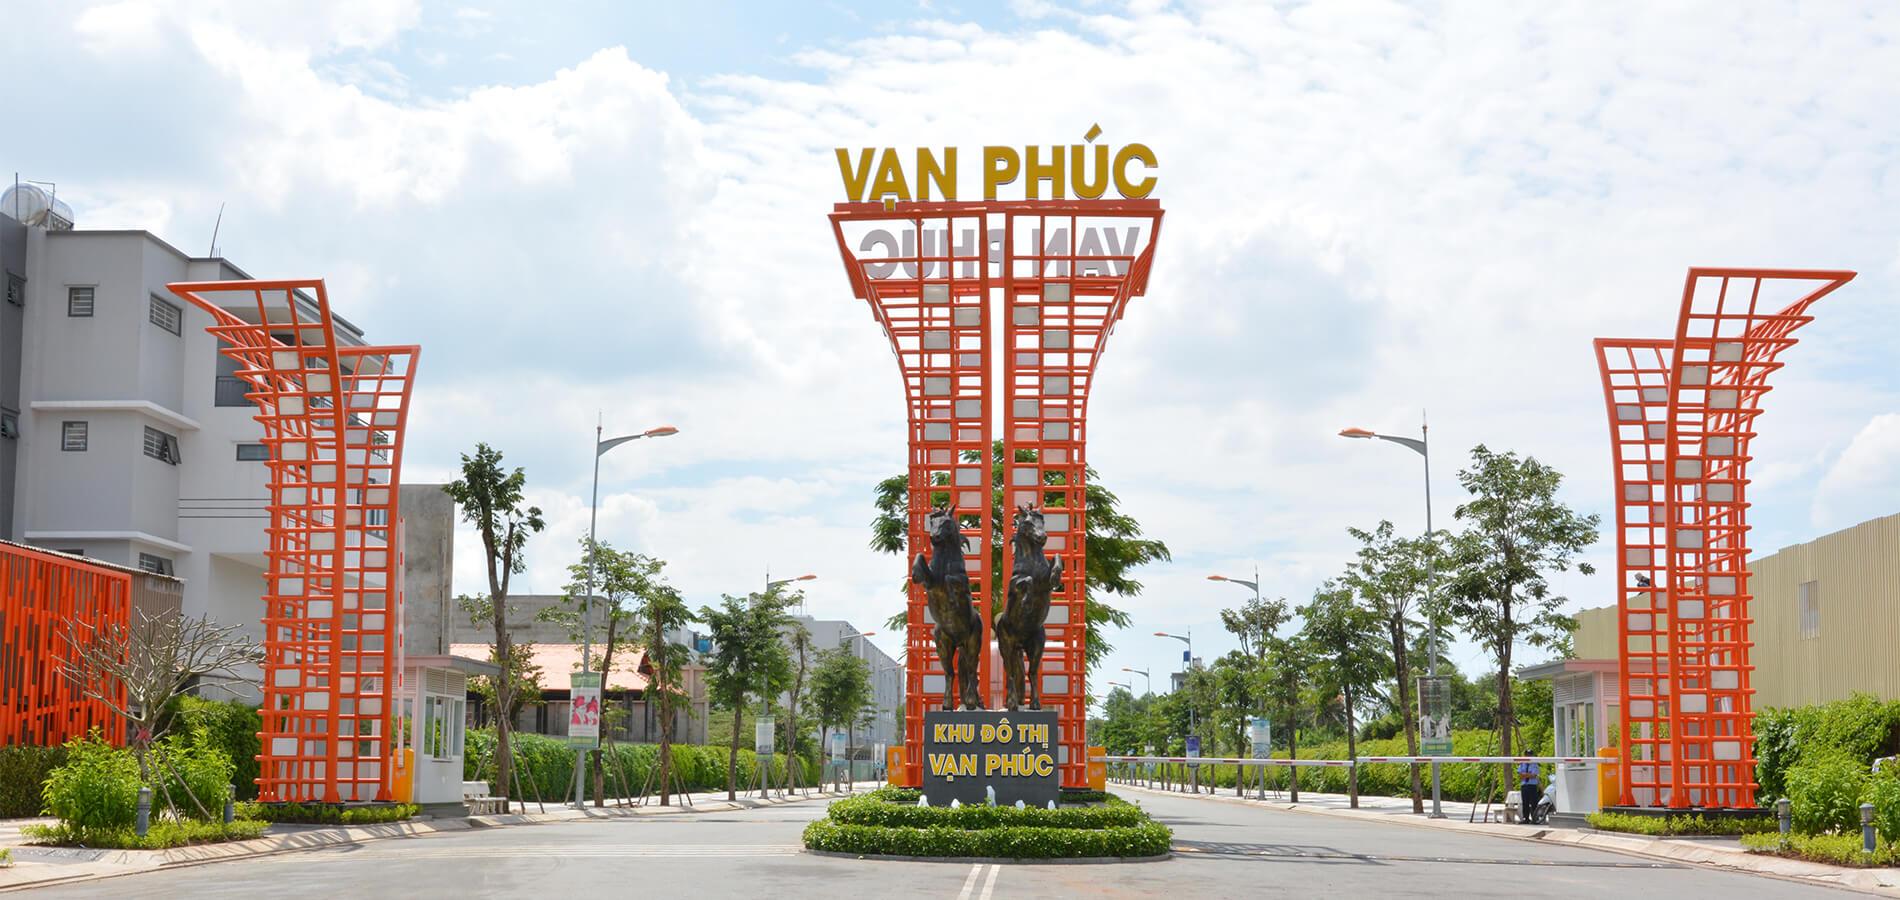 khu-do-thi-van-phuc-tien-do-thang-7-1